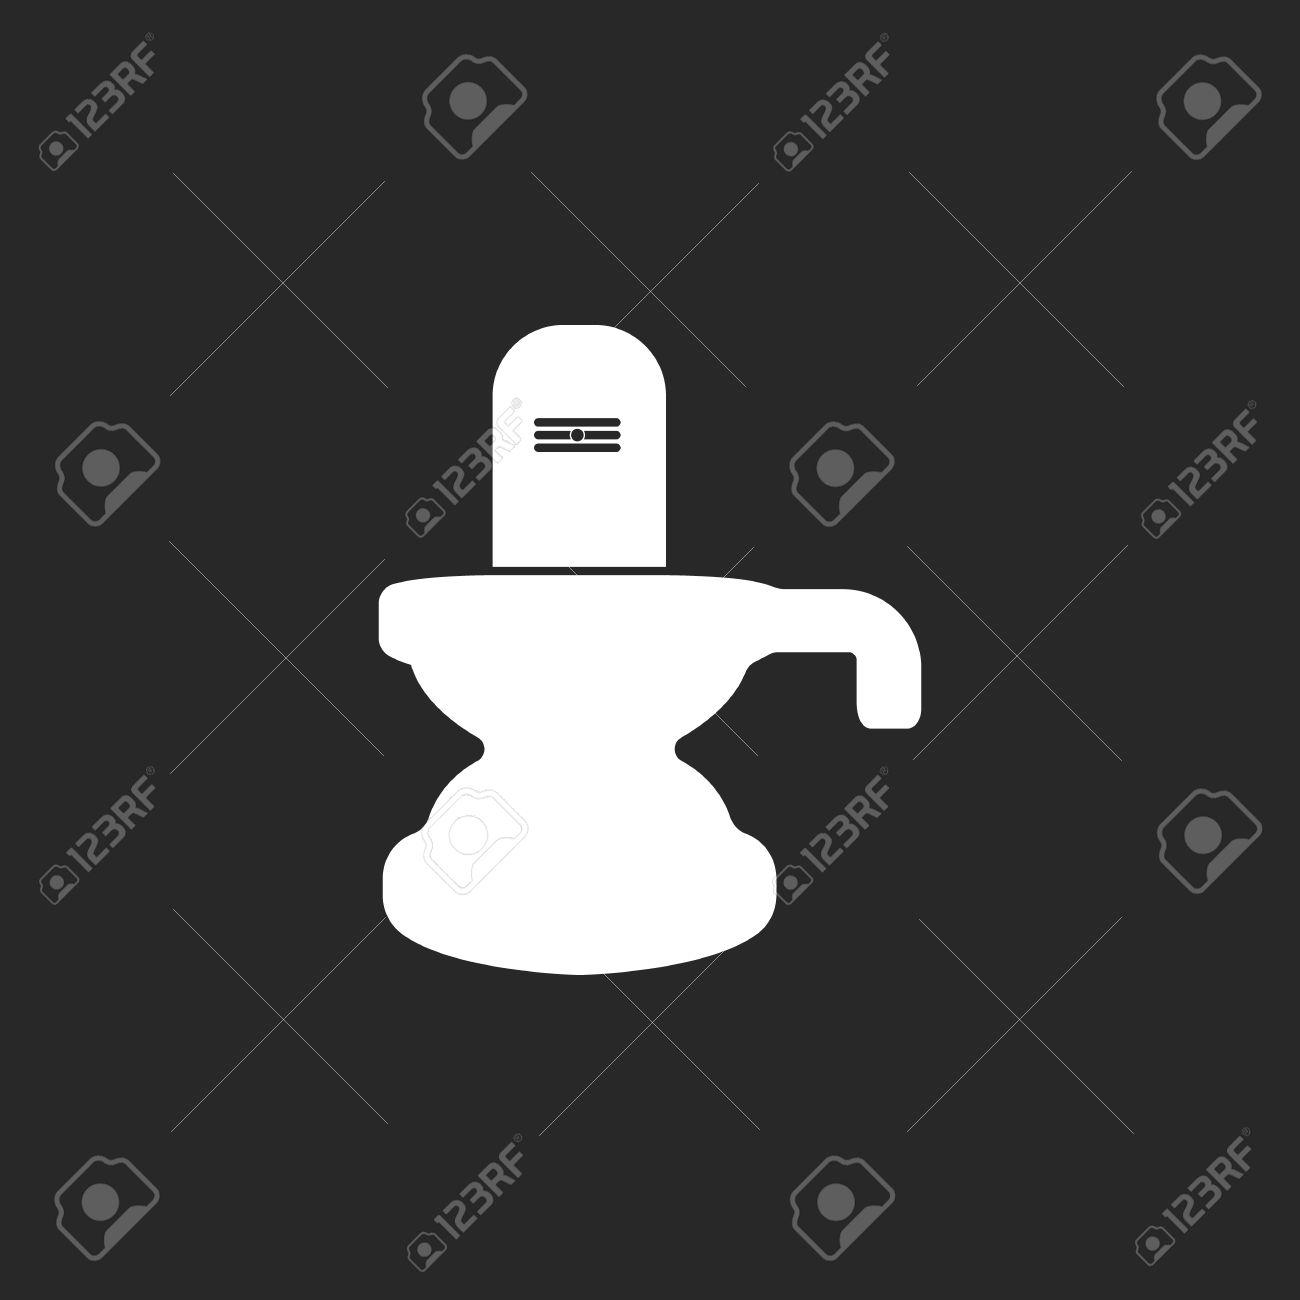 Shiva Lingam Symbol Sign Simple Icon On Background Royalty Free